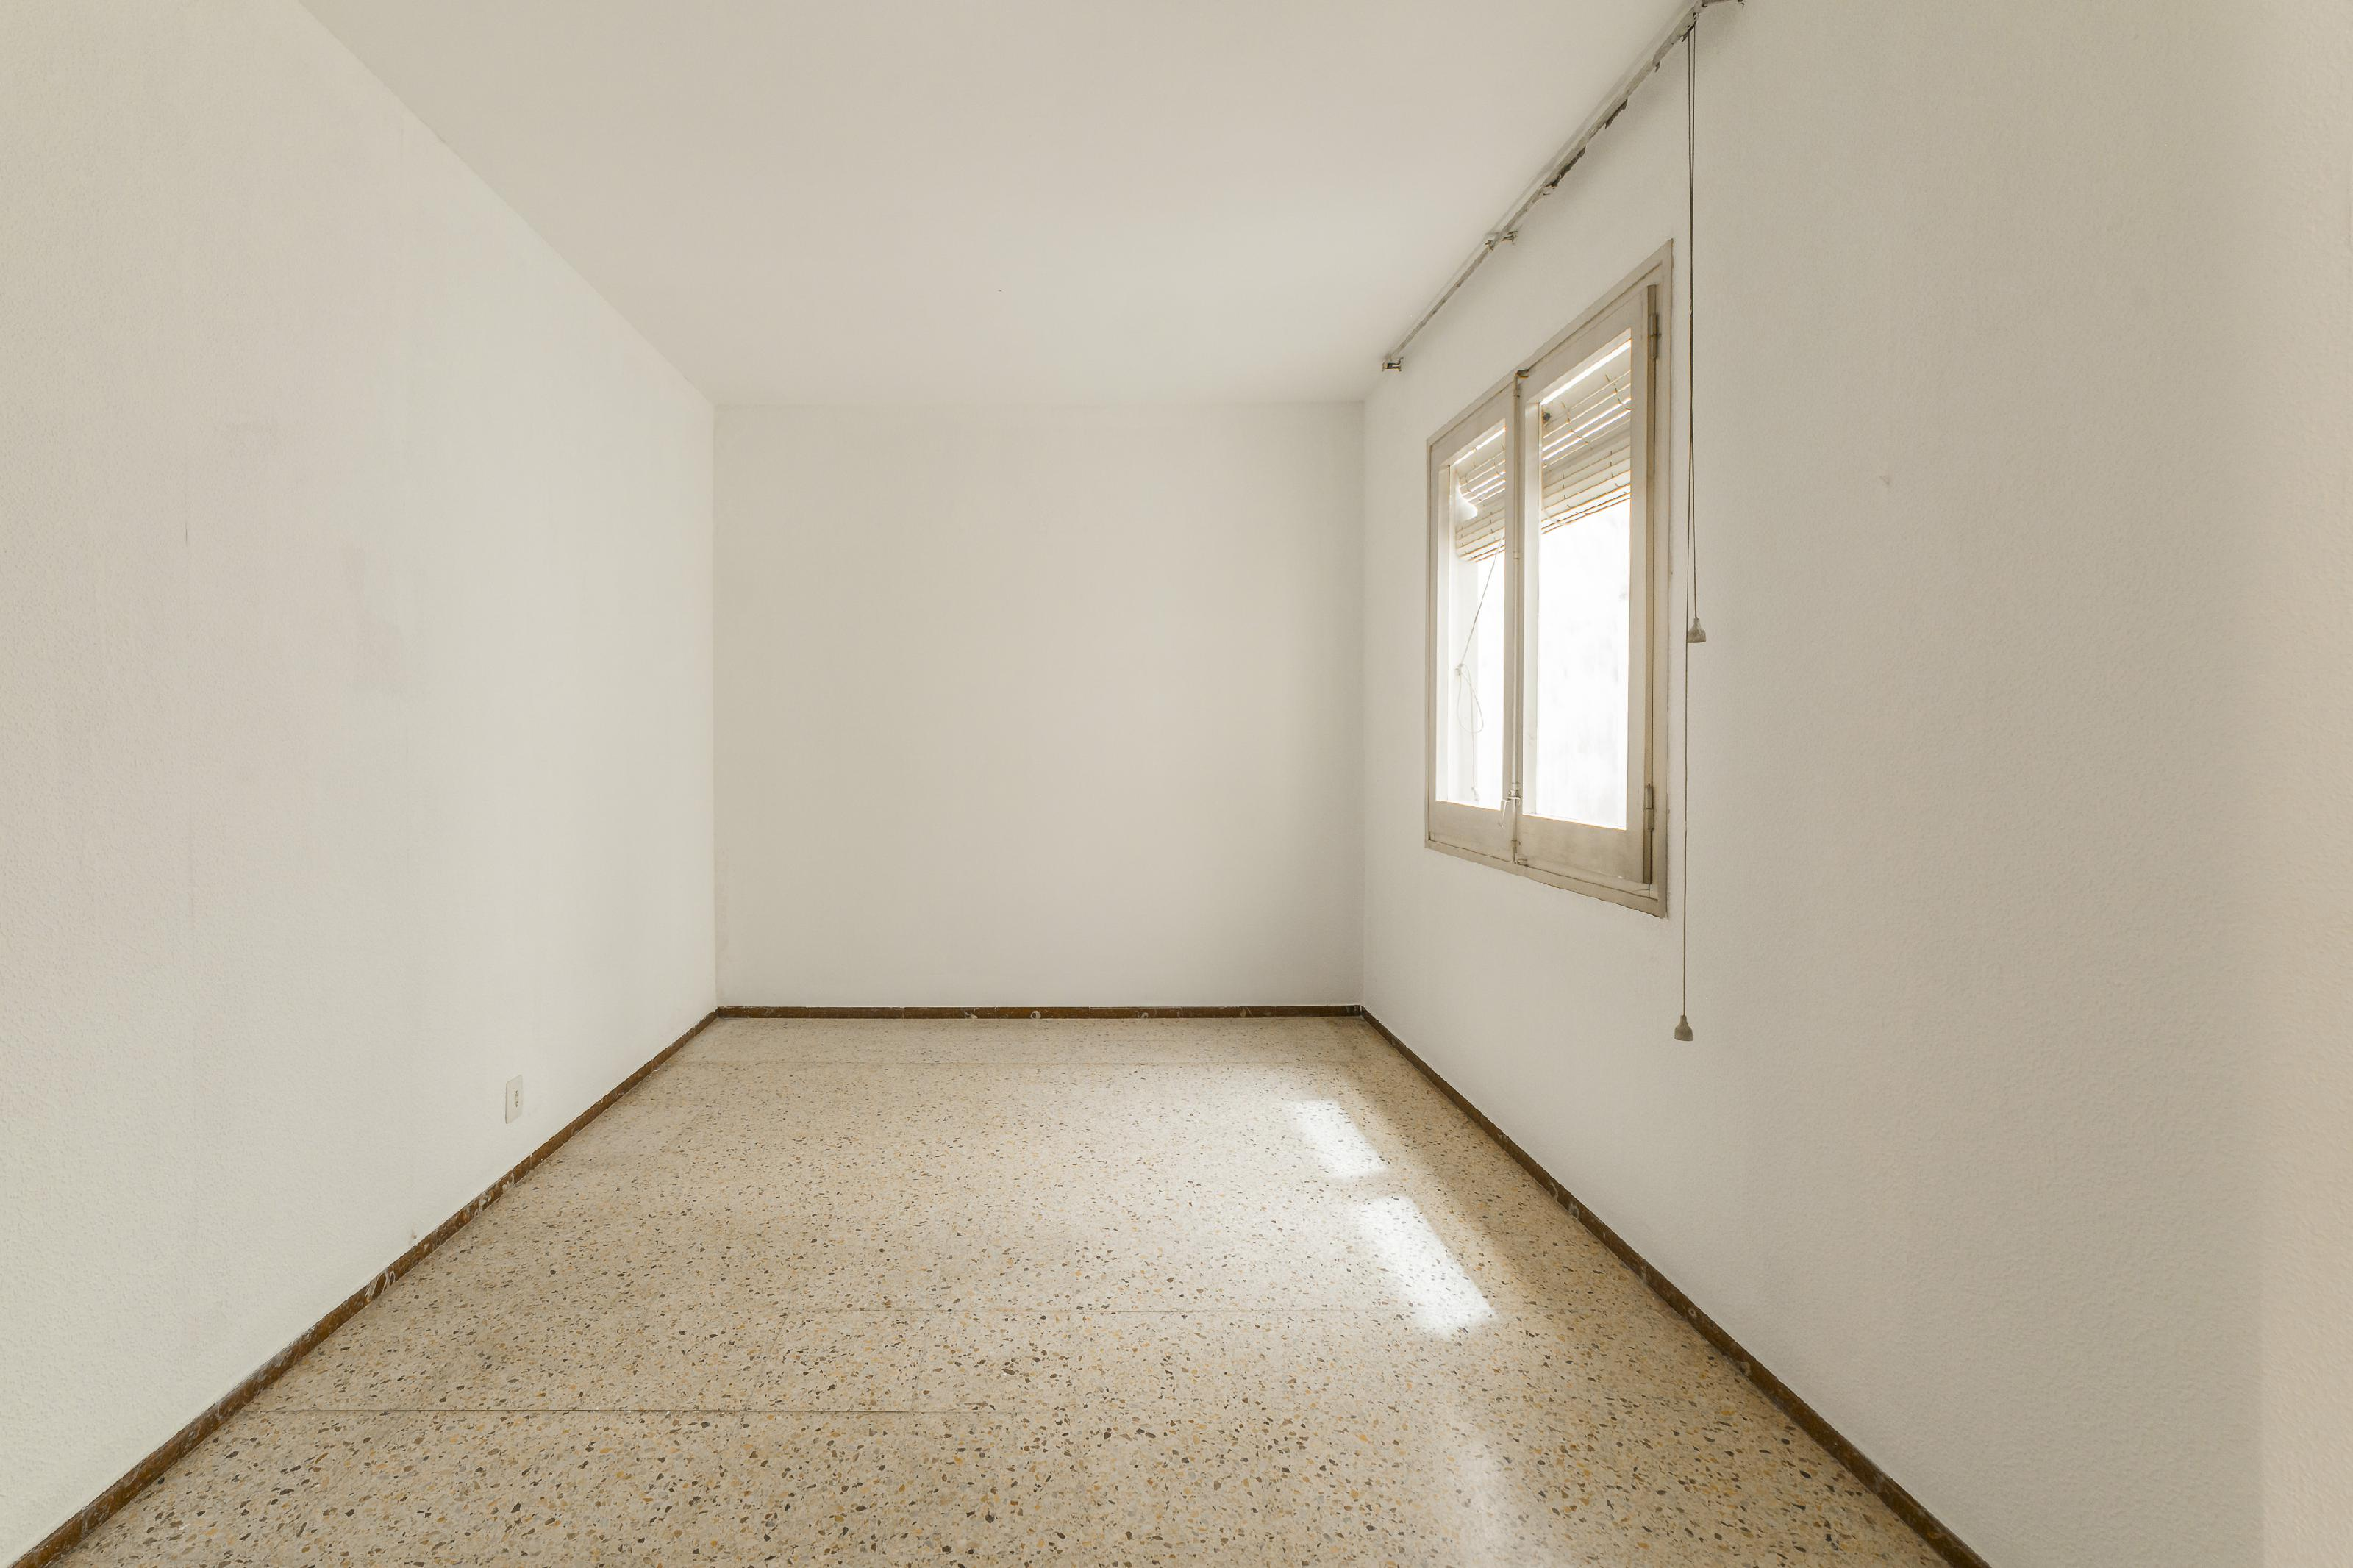 247624 Flat for sale in Eixample, Sant Antoni 16